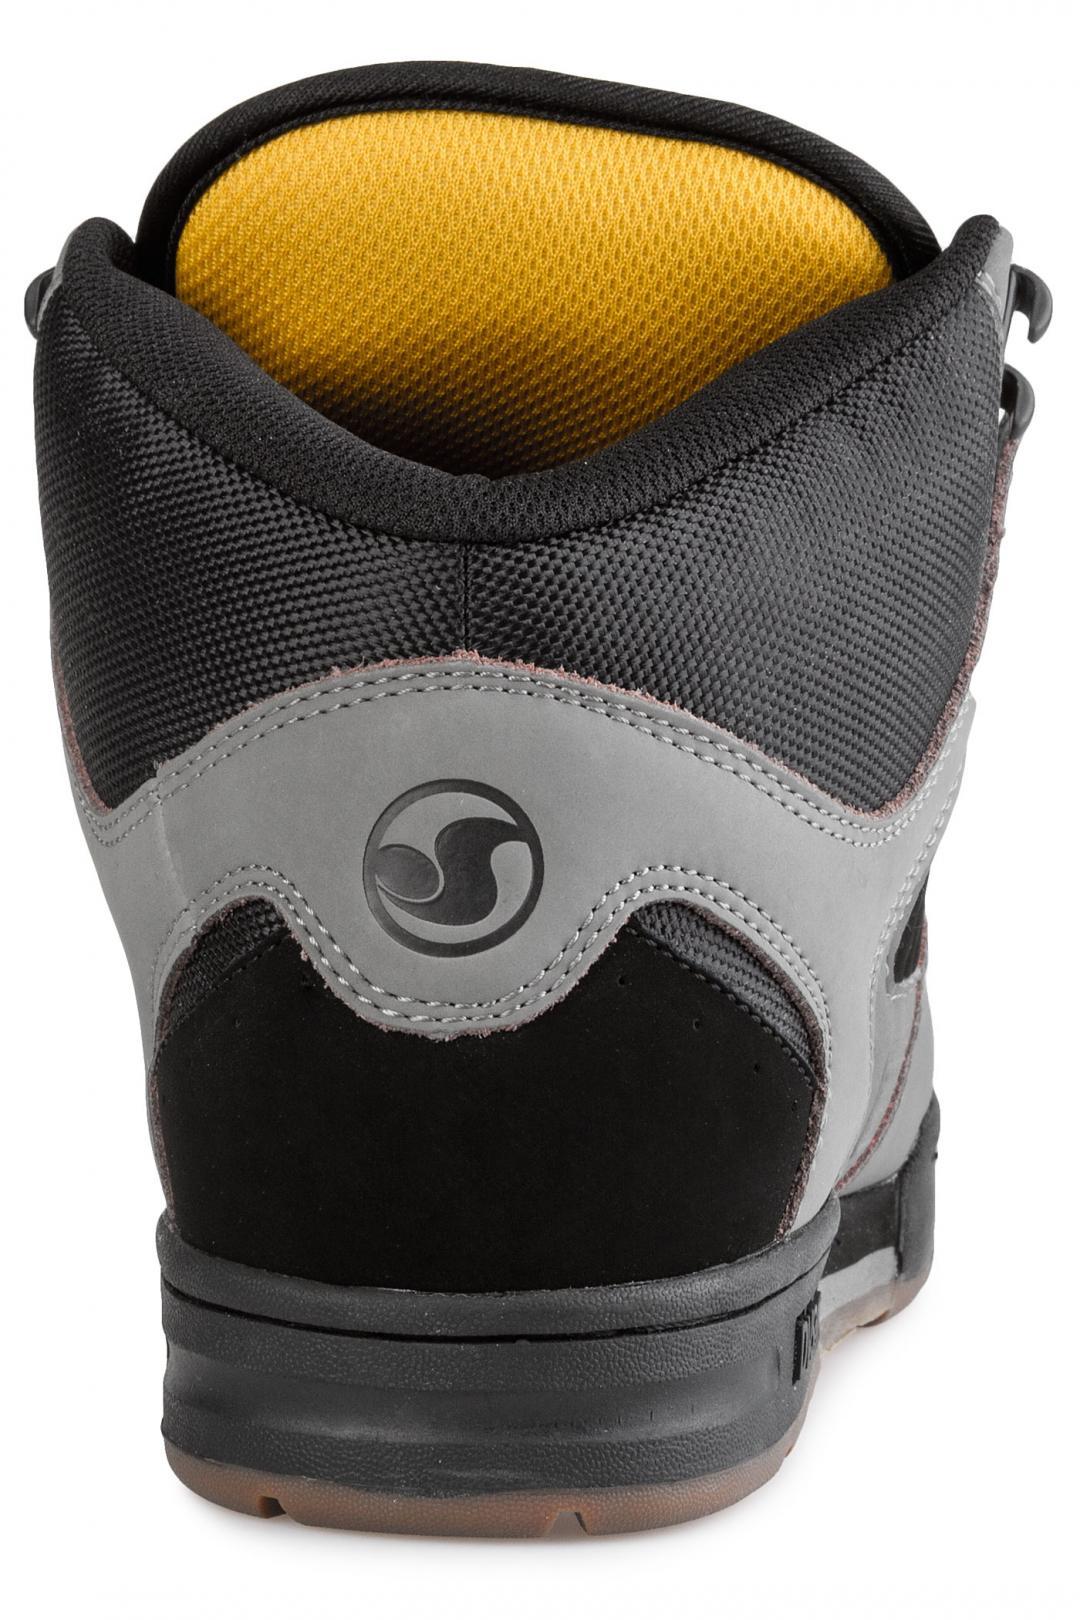 Uomo DVS Militia Boot Nubuck charcoal black gold | Sneakers high top